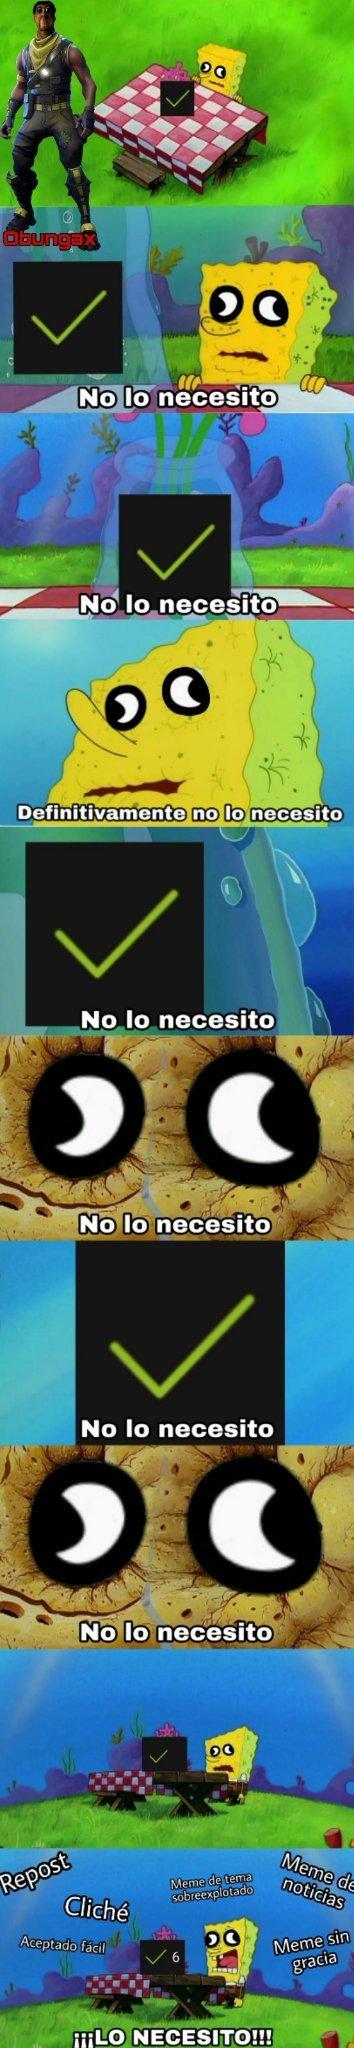 Vean mi canal: obungaguago - meme